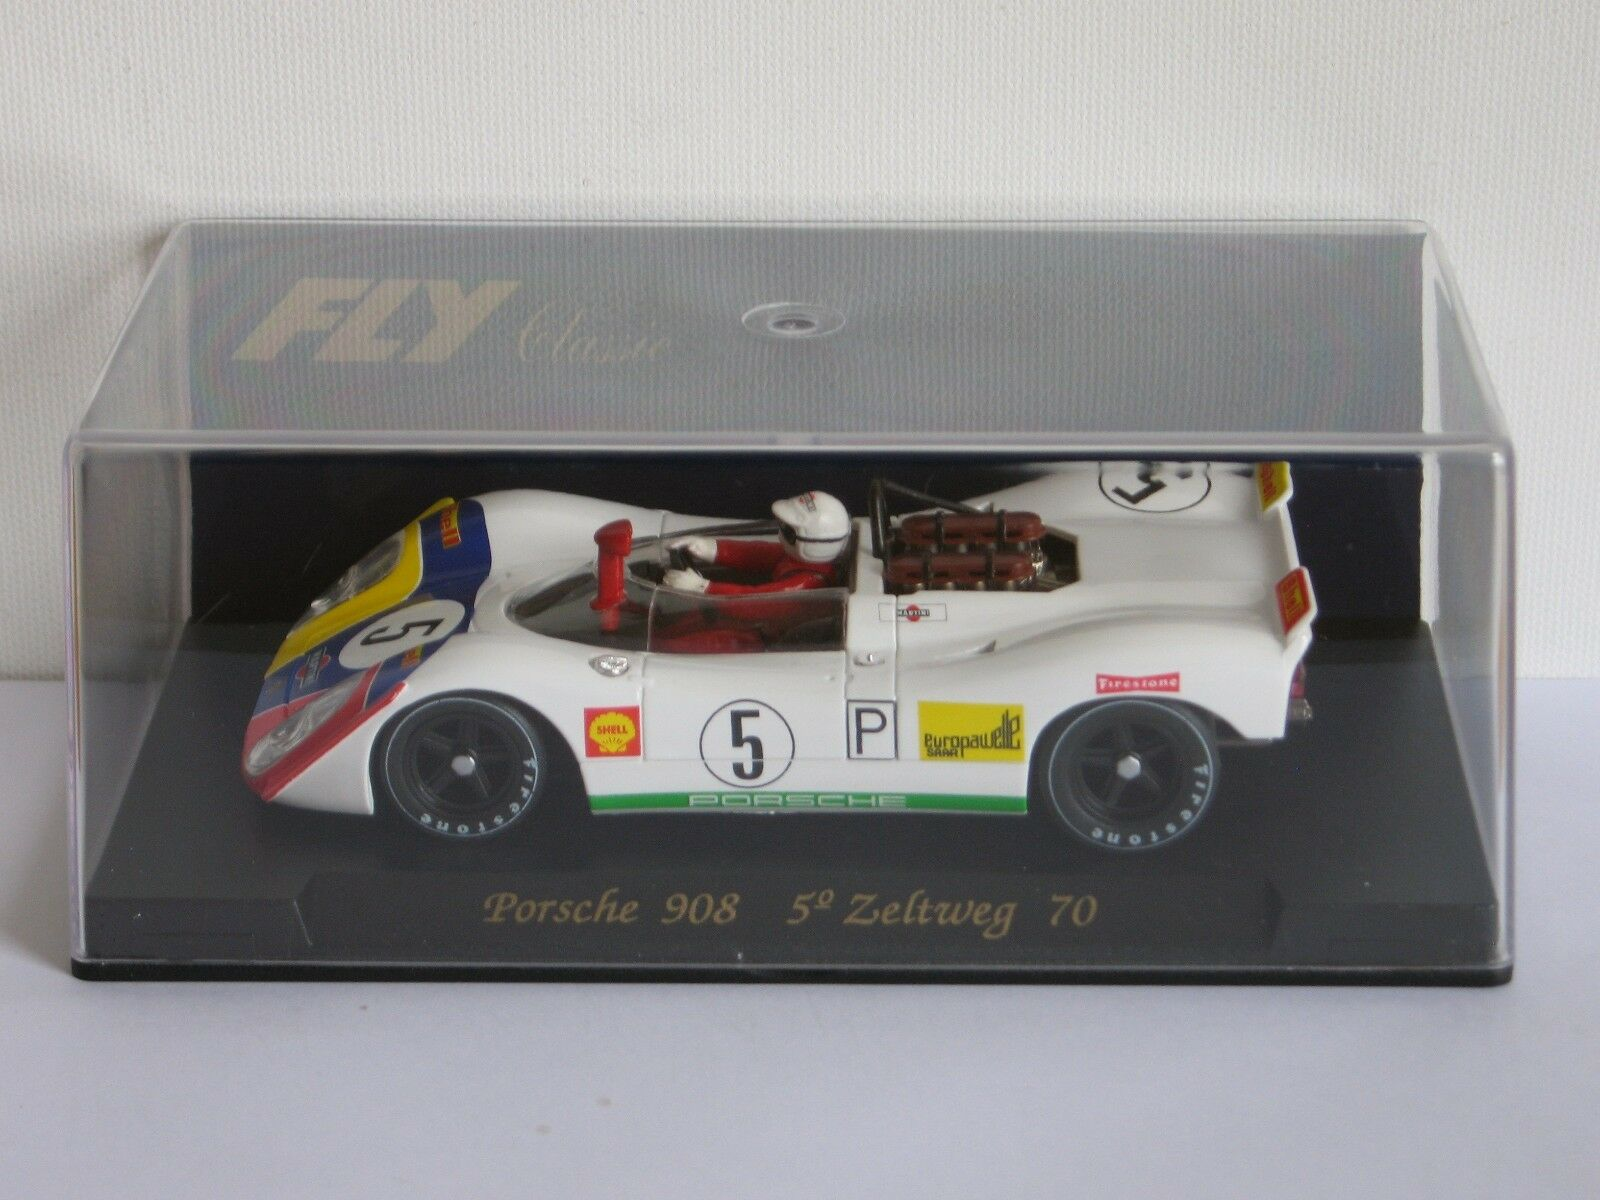 FLY Car Classic Porsche 908 5° Zeltweg 1970 Martini - Ref. C16